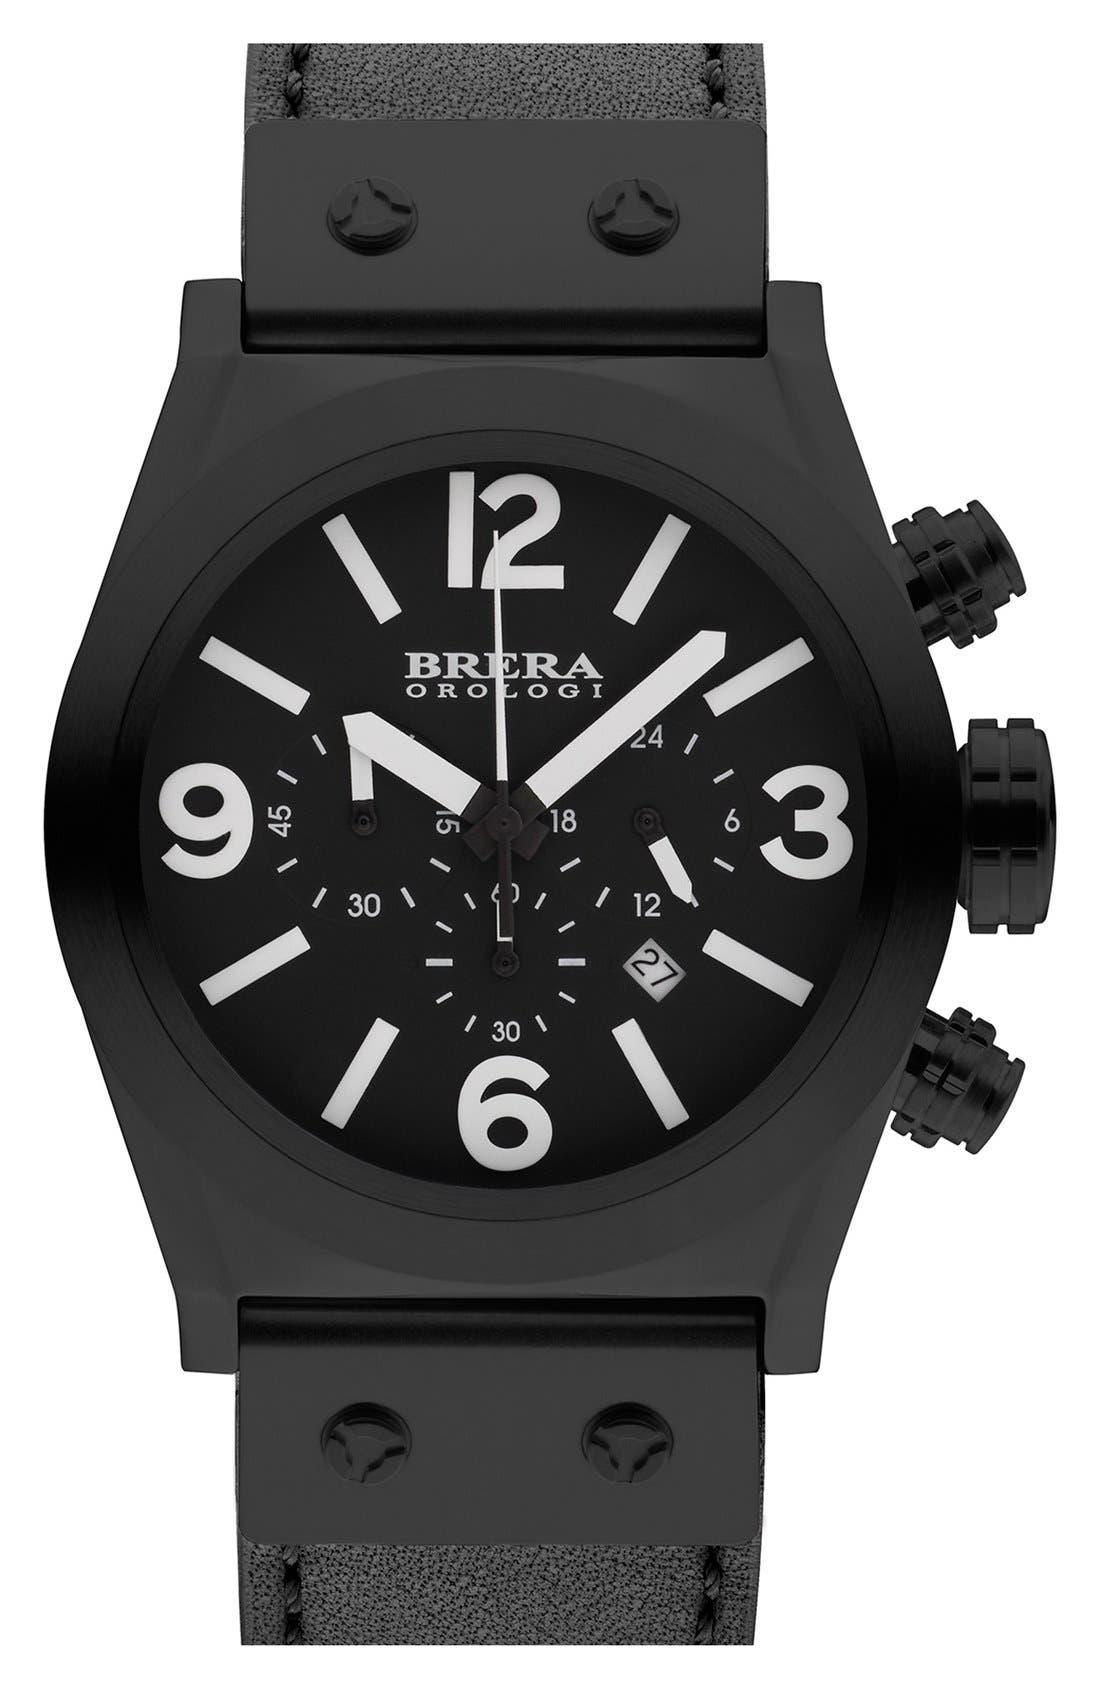 Main Image - Brera Orologi 'Eterno Piccolo' Chronograph Leather Strap Watch, 38mm (Nordstrom Exclusive)